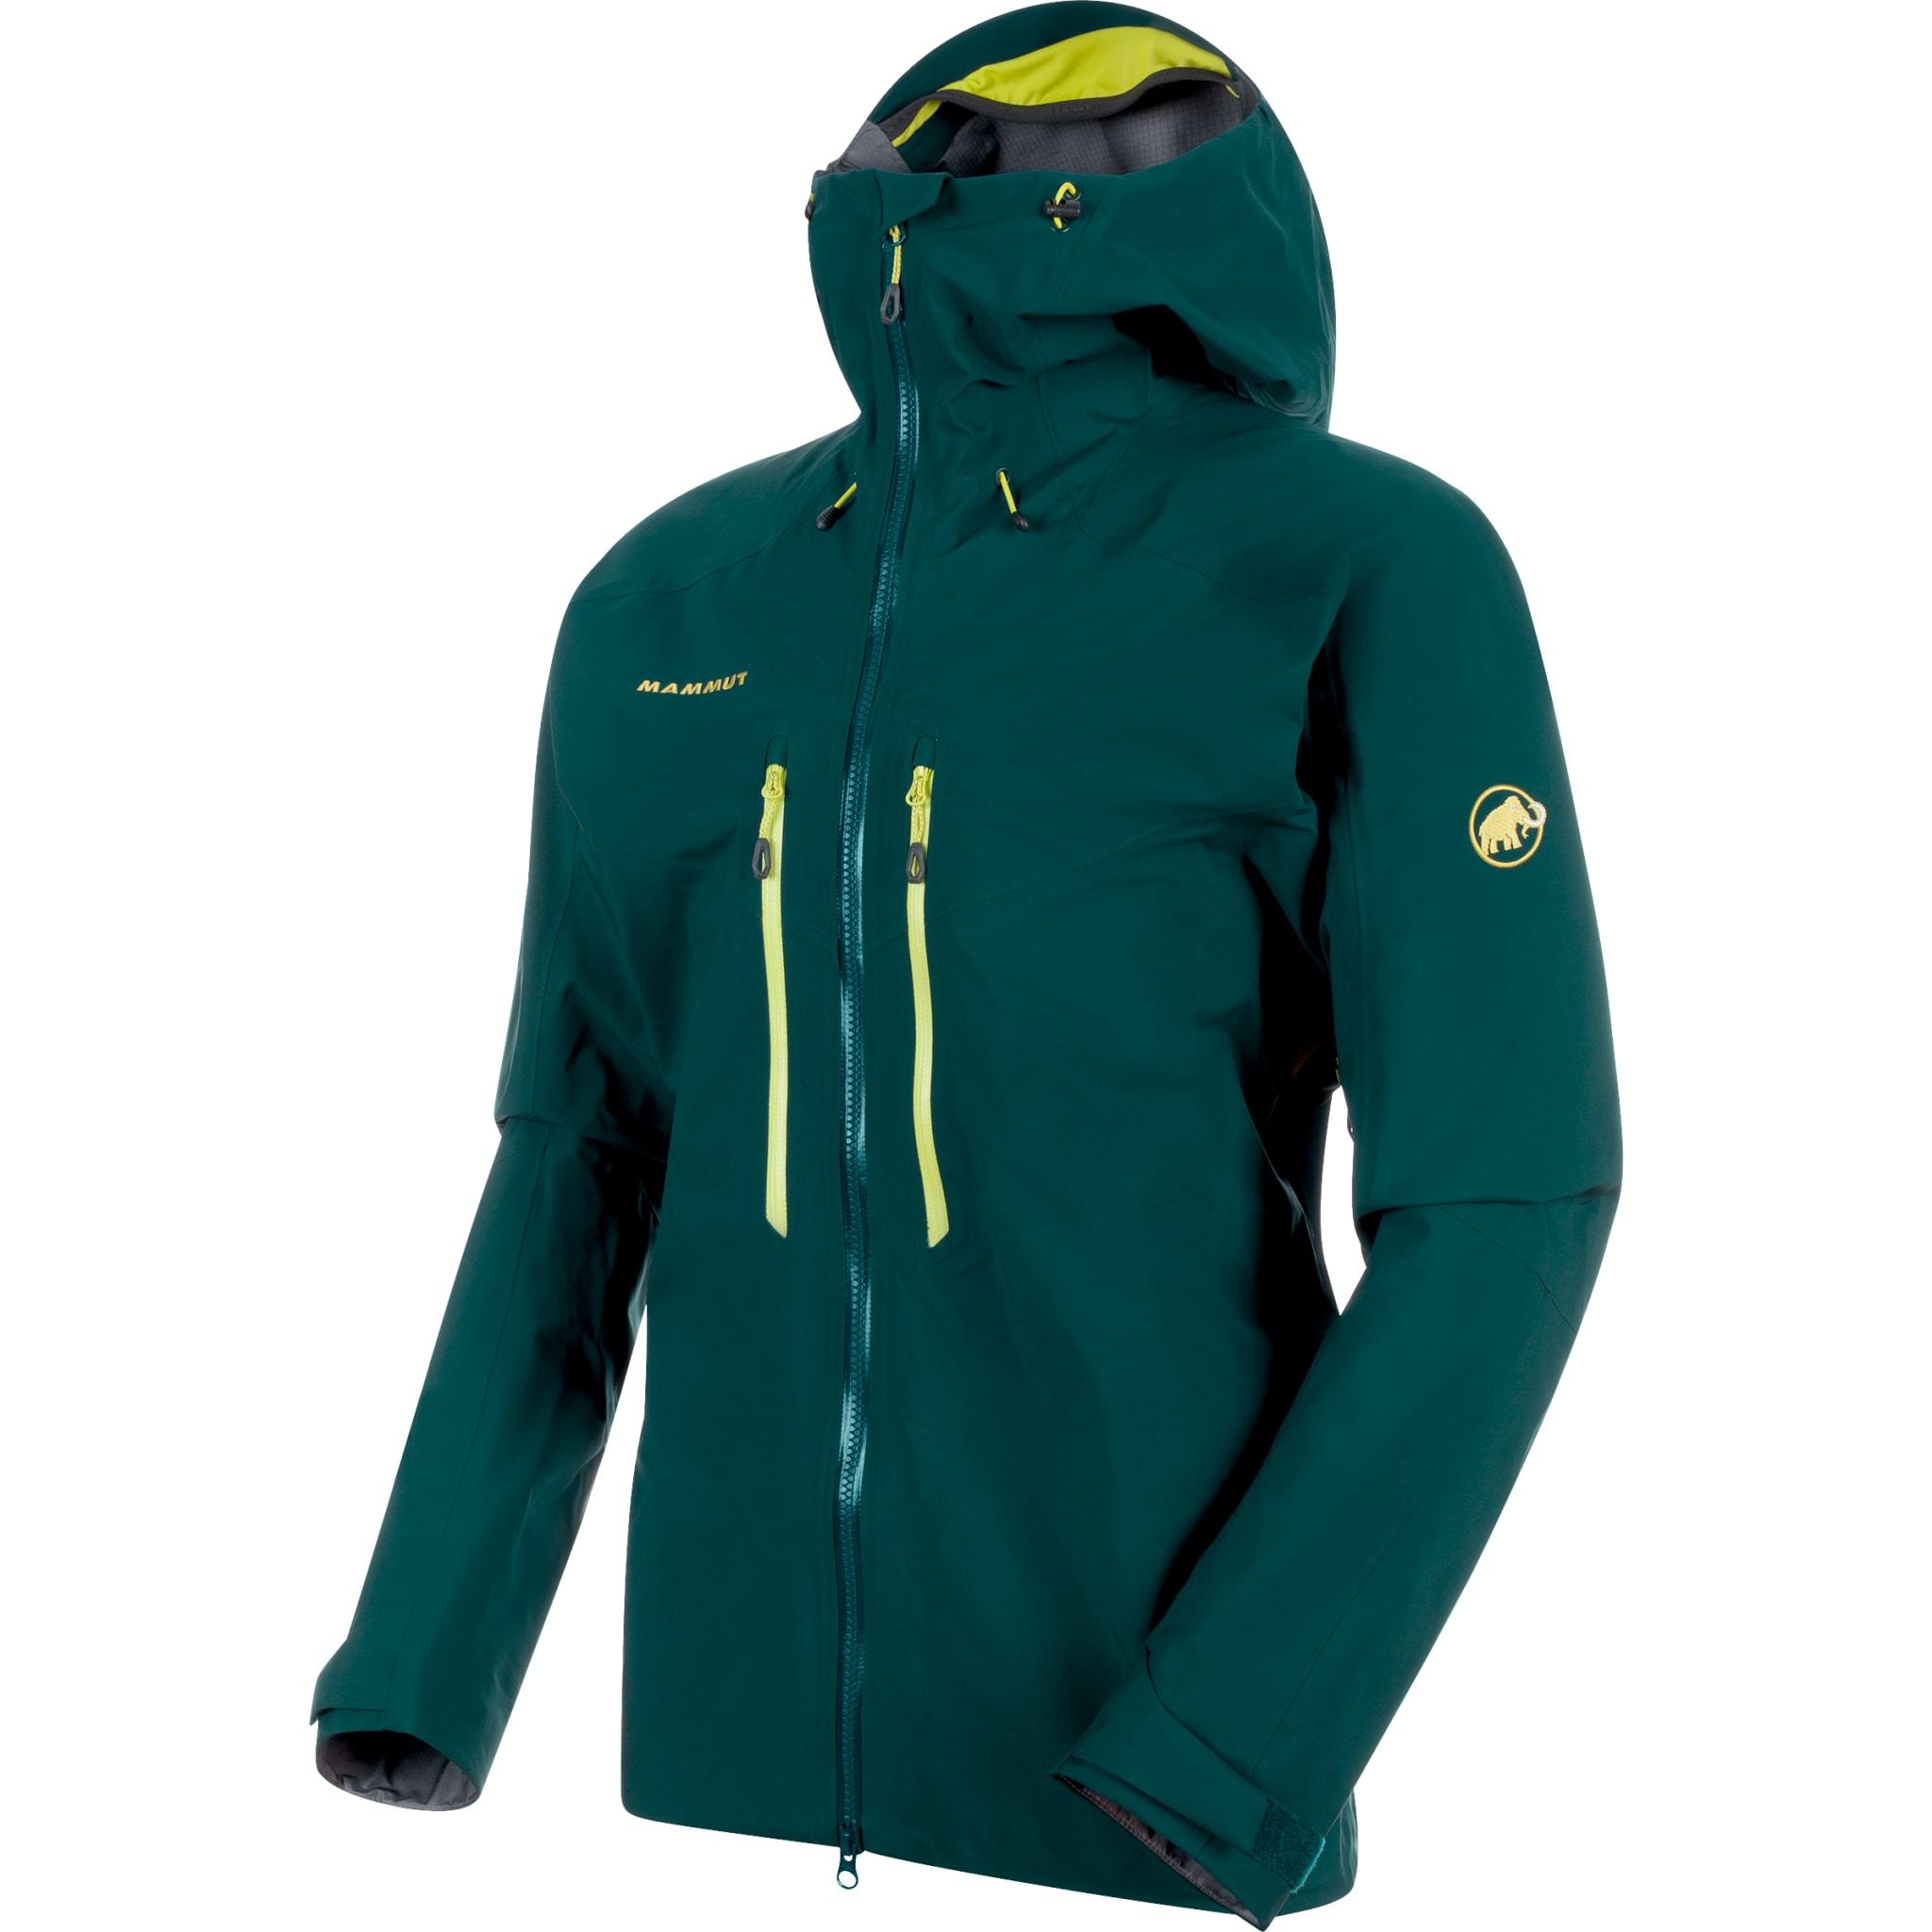 Meron HS Hooded Jacket Ms